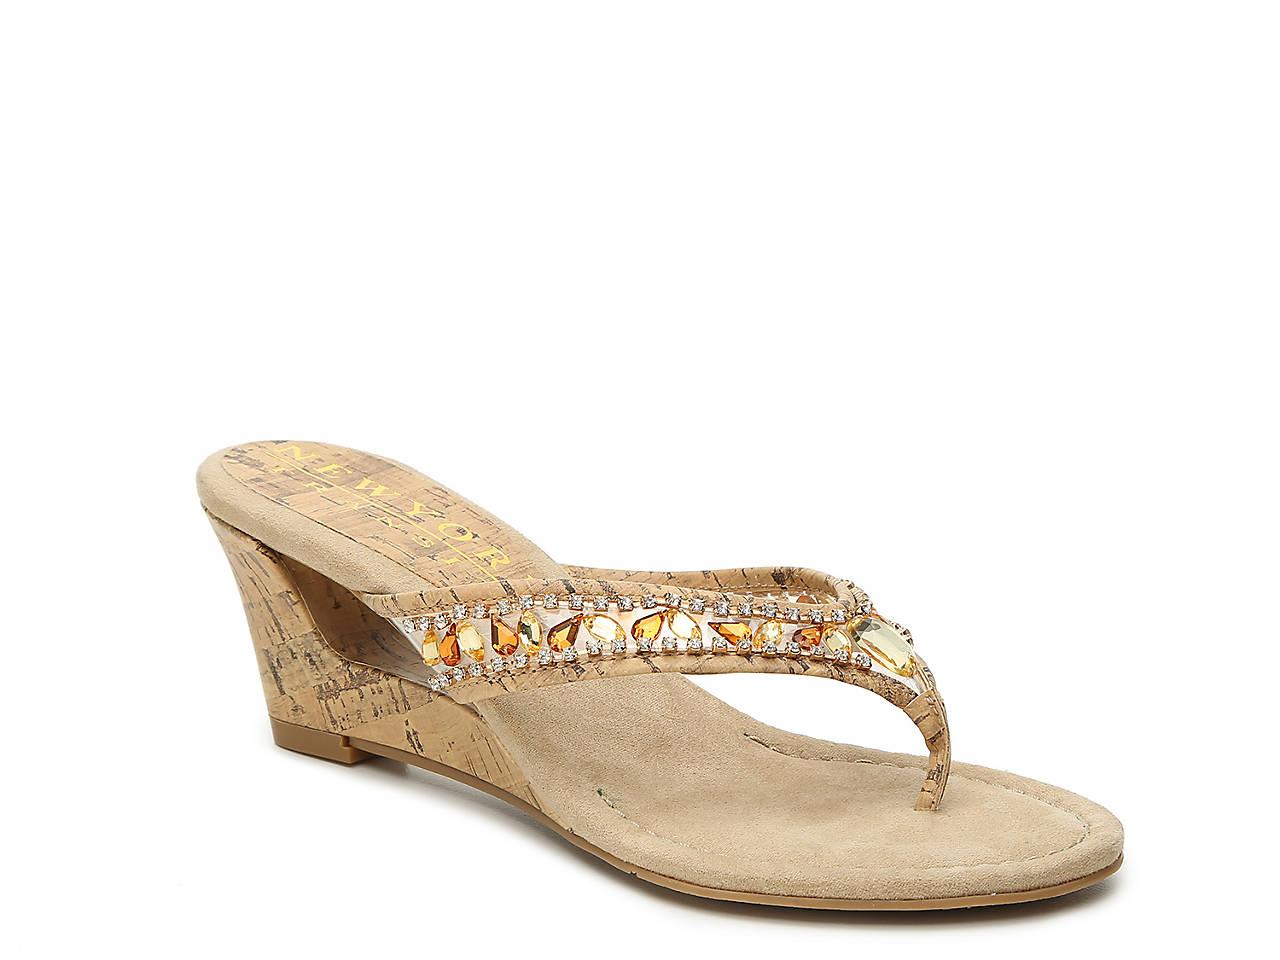 New York Transit Fun Time ... Women's Wedge Sandals buy cheap footlocker QGumIH